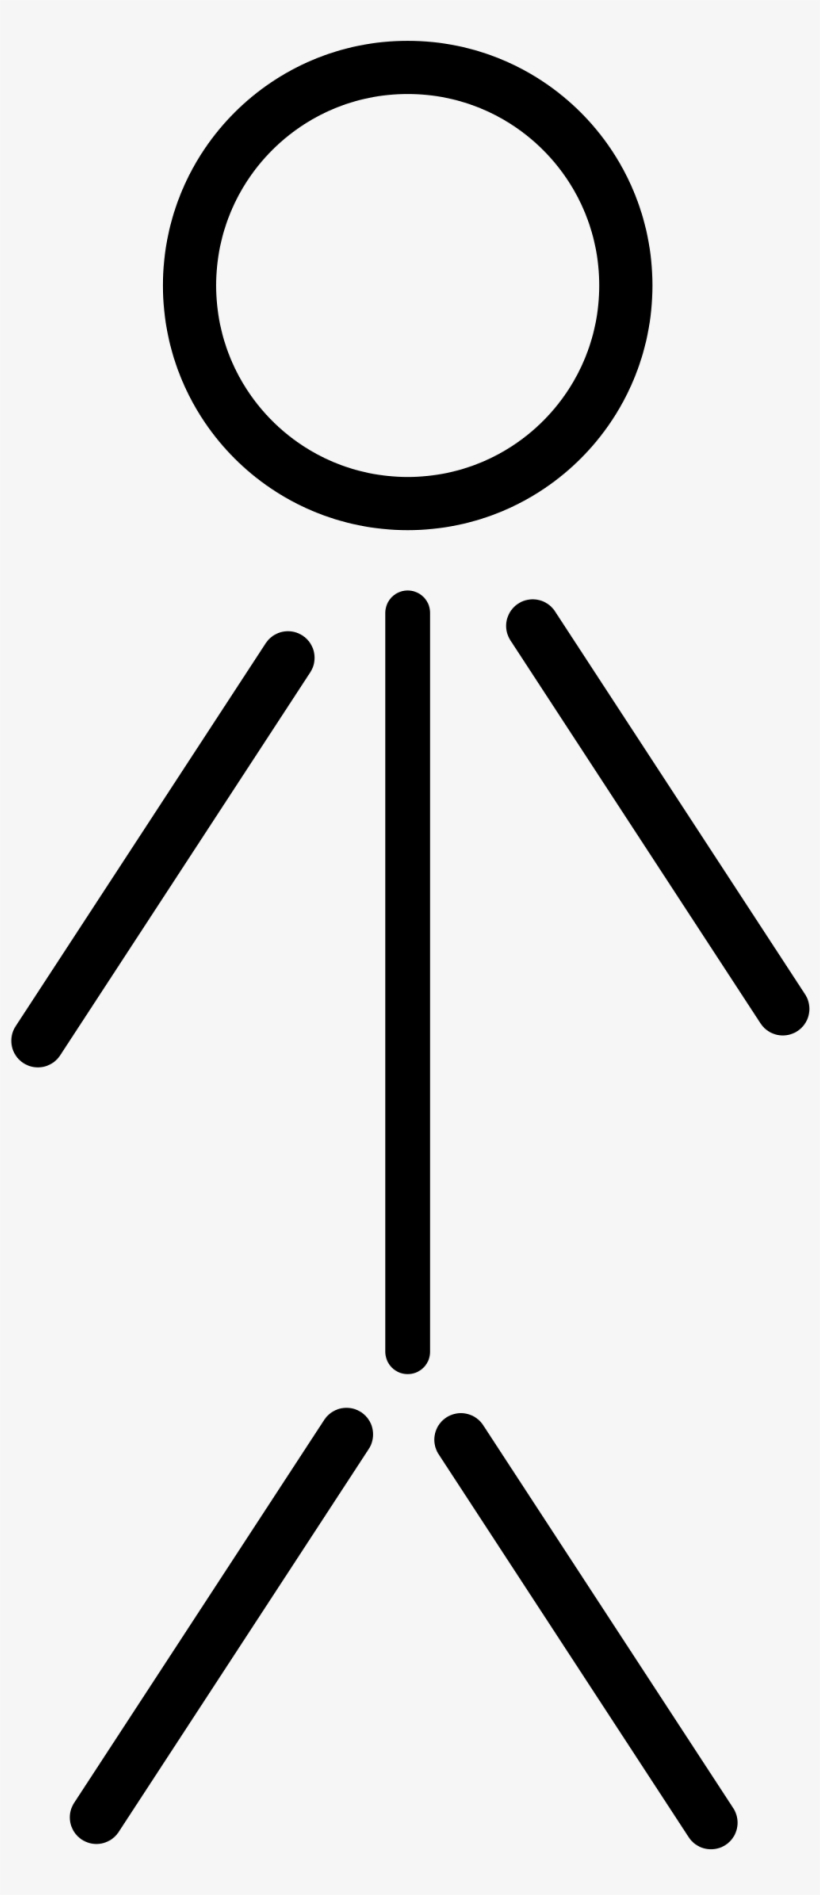 People - Clipart Stick Figure, transparent png #7173